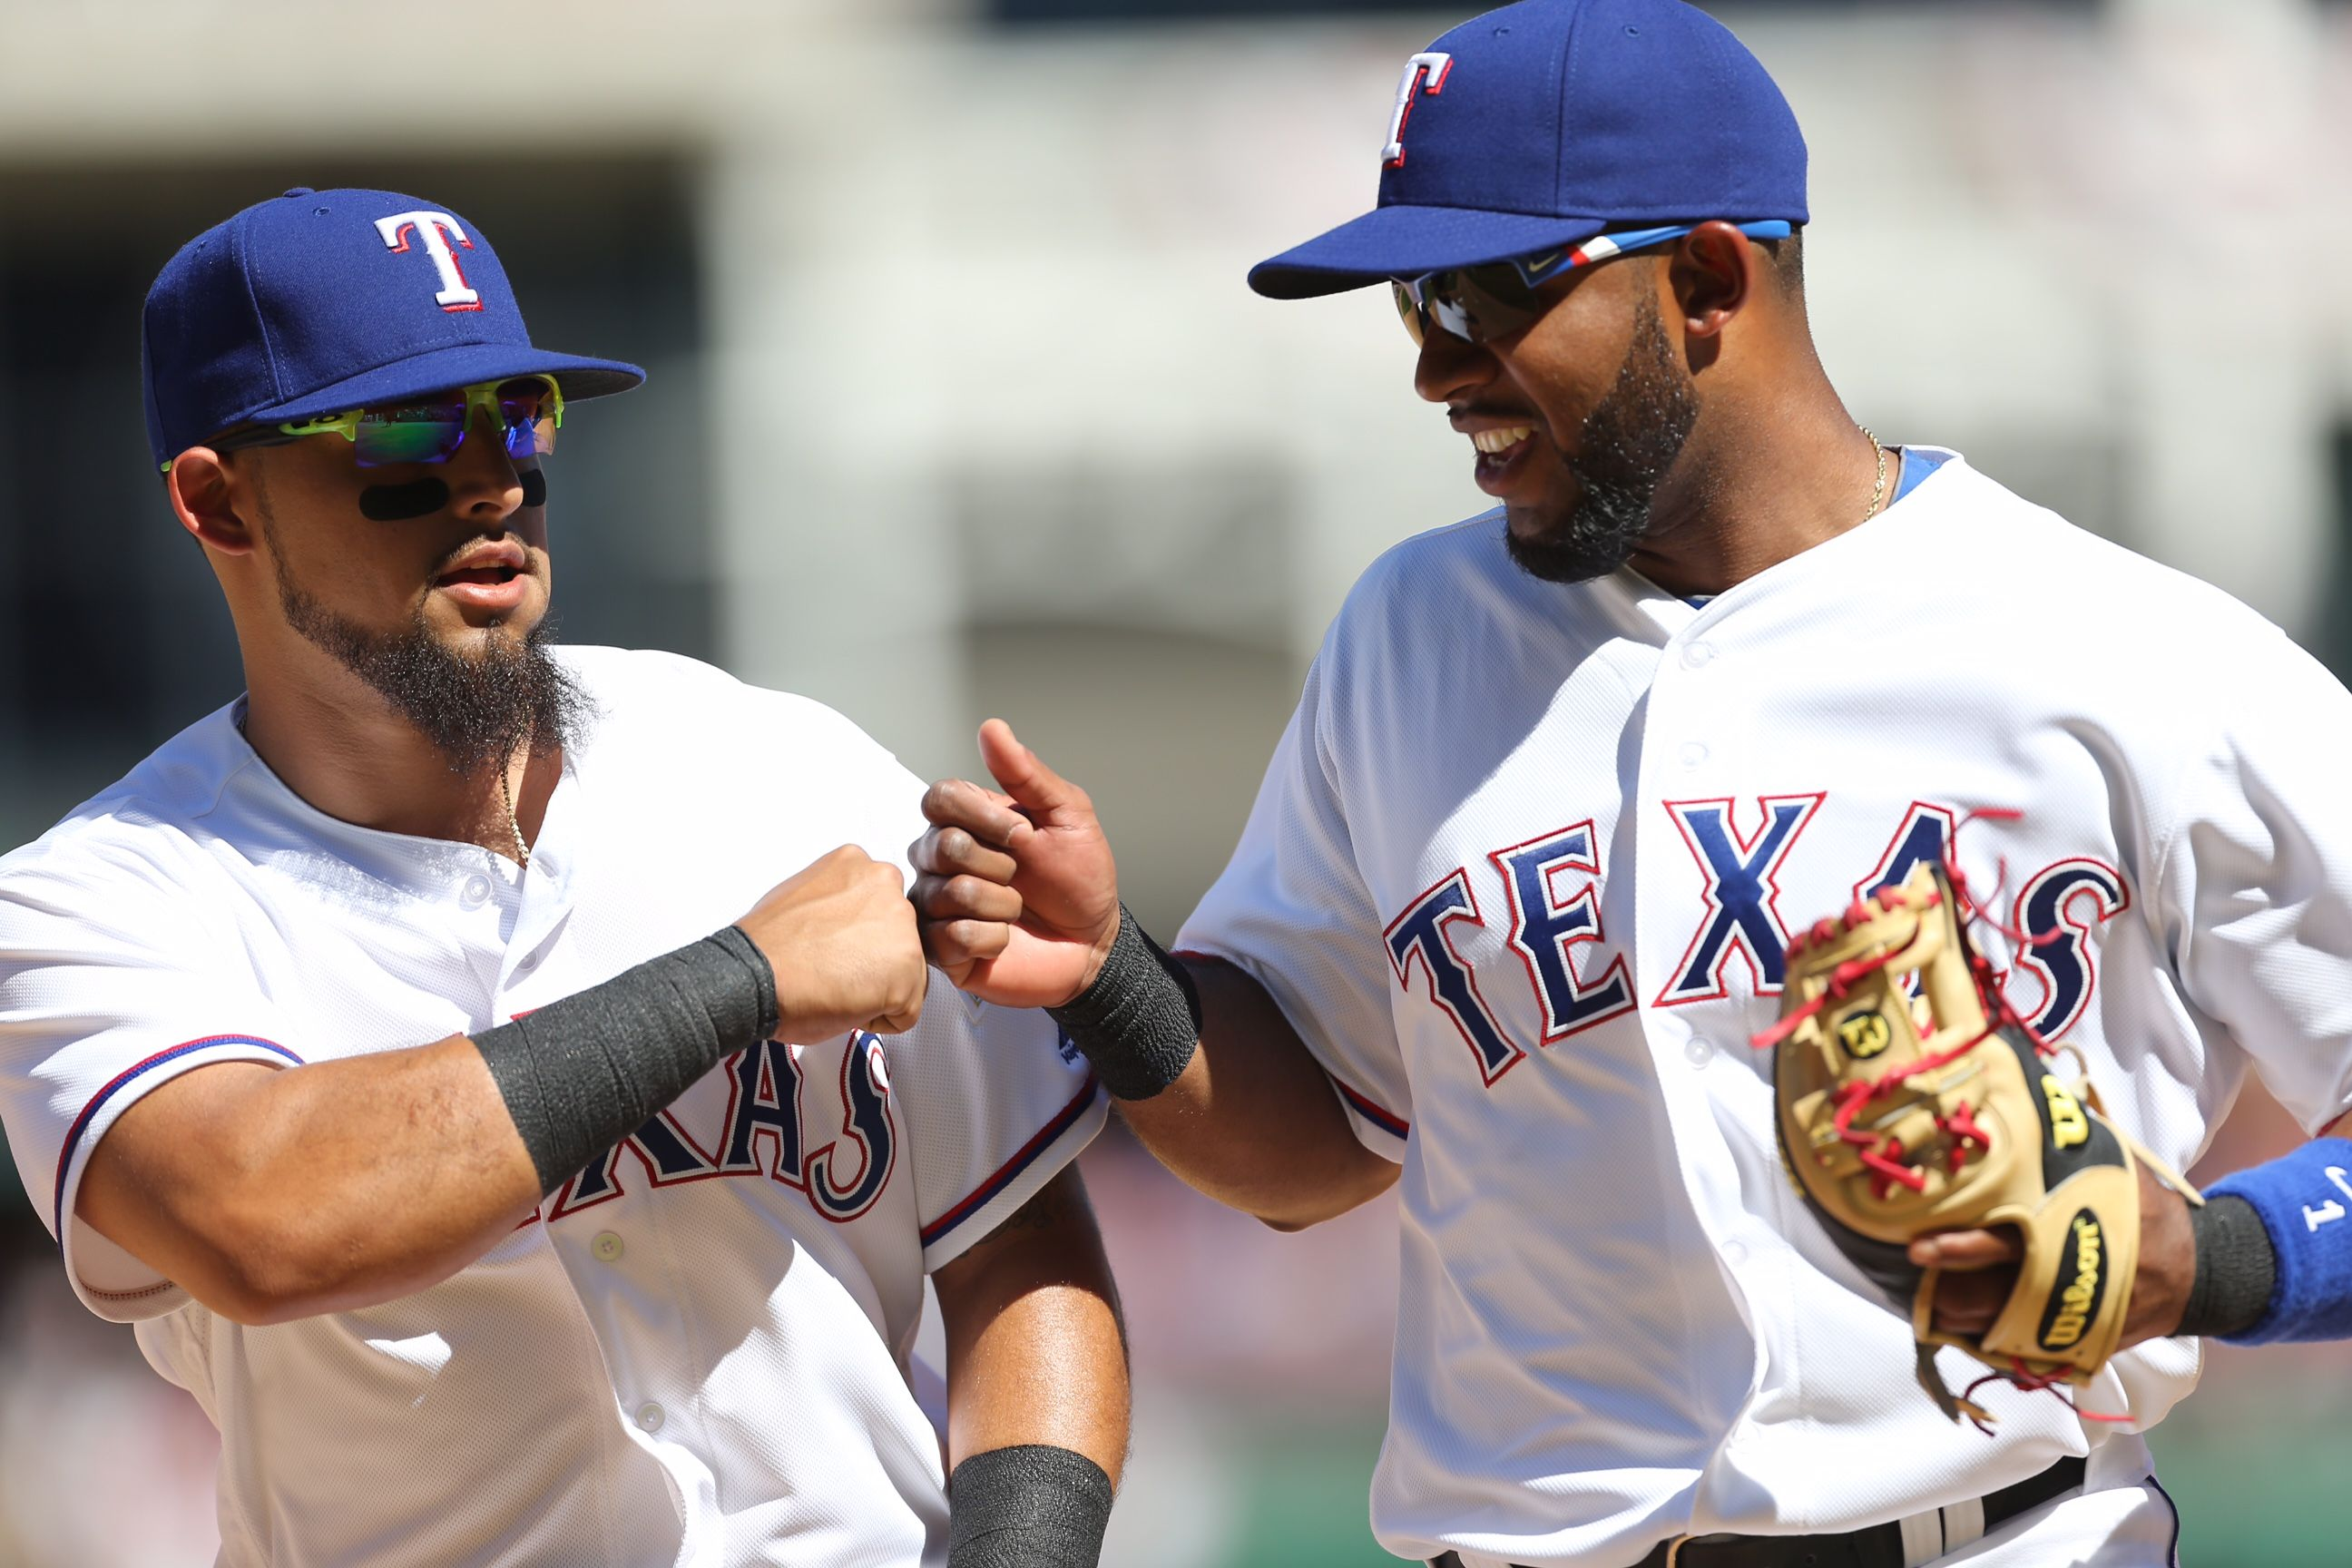 Seton Hall vs. No. 22 Texas Tech Pirates pull away late